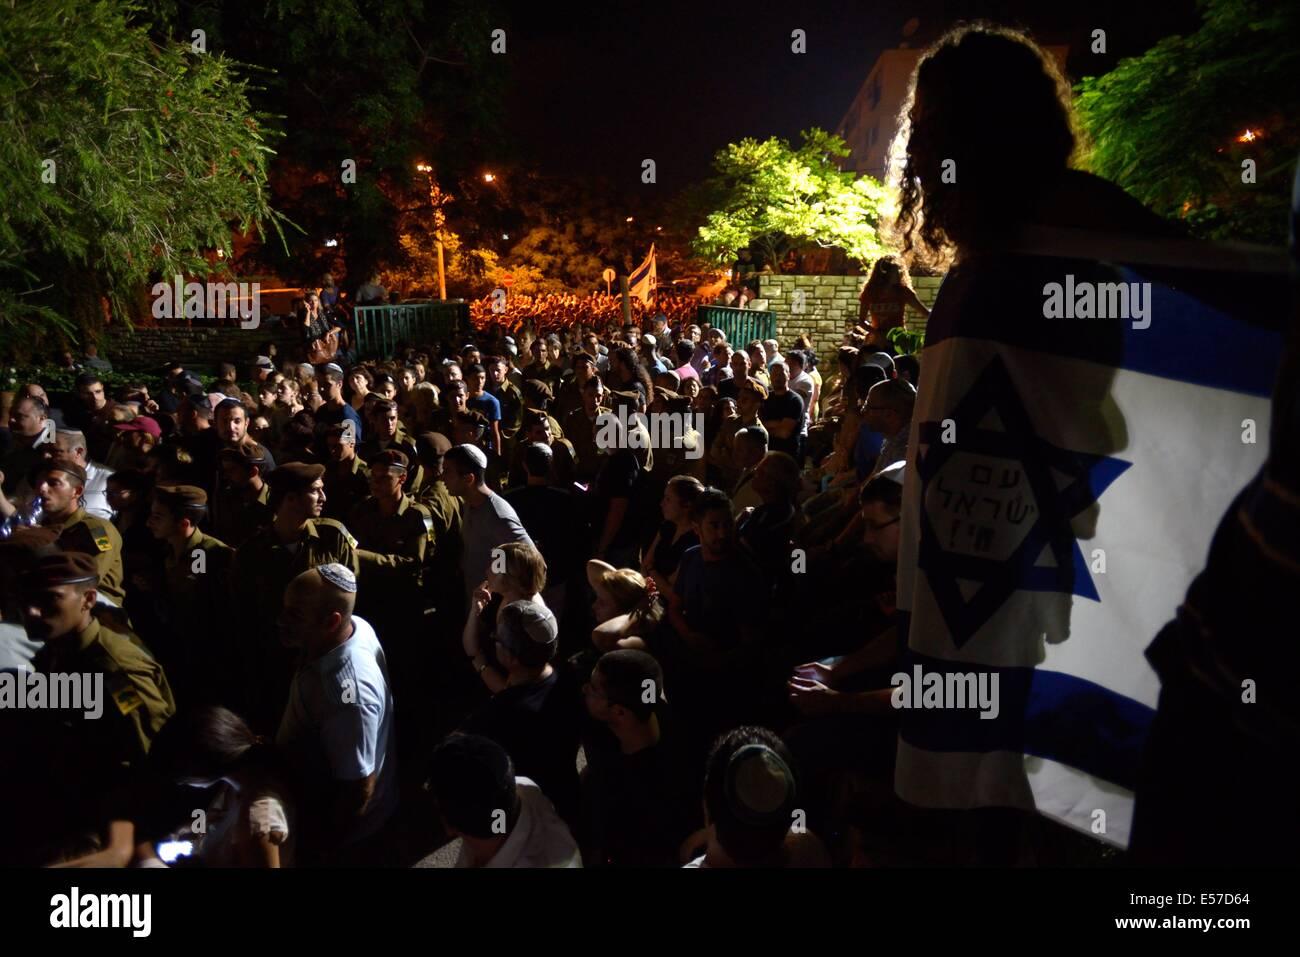 July 21, 2014 - Haifa, Israel - HAIFA, ISRAEL - JULY 21, 2014: Some dozens of thousands of Israelis attended the - Stock Image